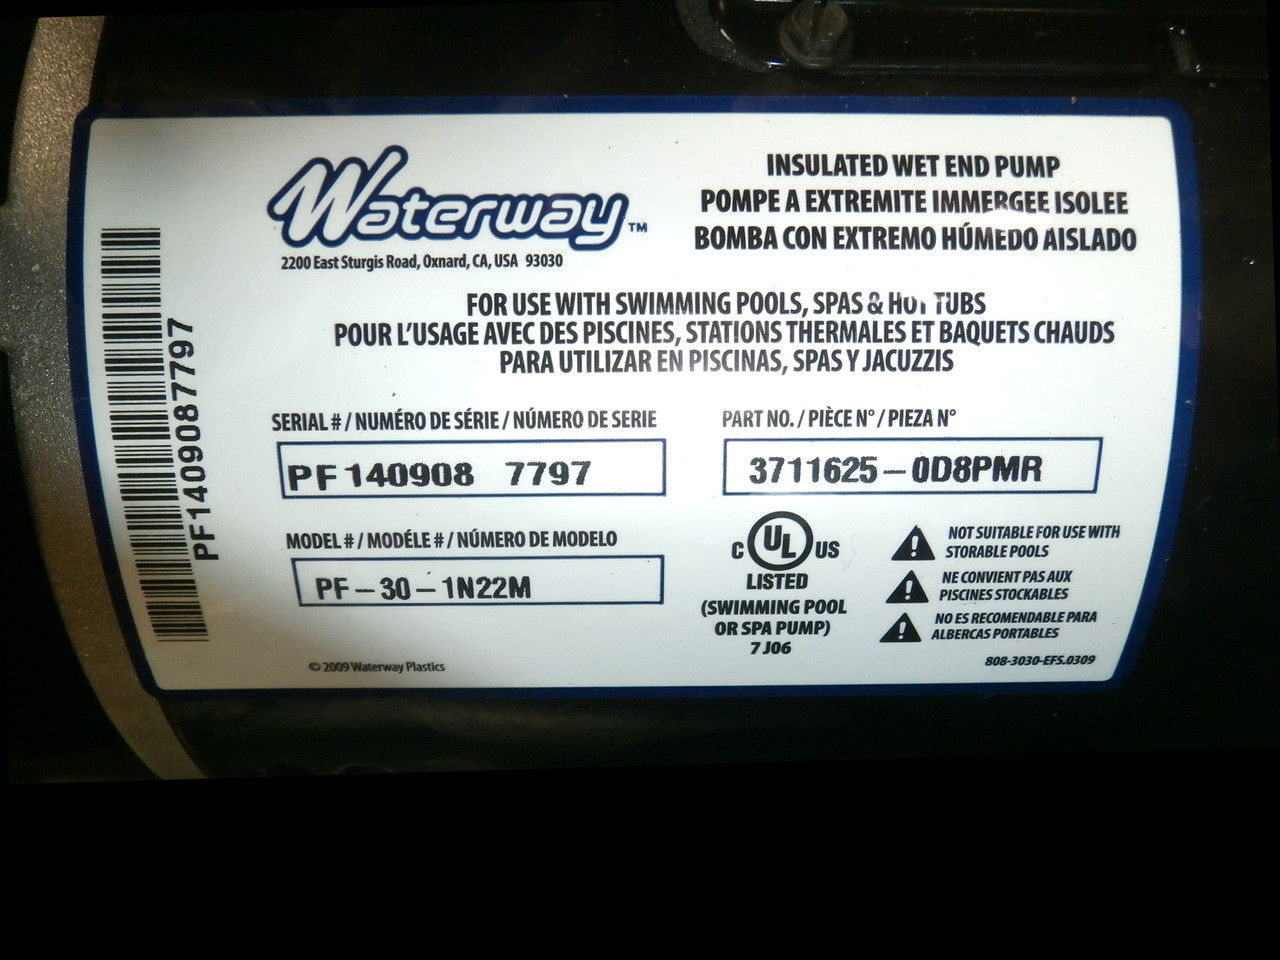 Piscines Es & Spas x320500 - spa pump - 12a 1spd 56 frame executive waterway pump